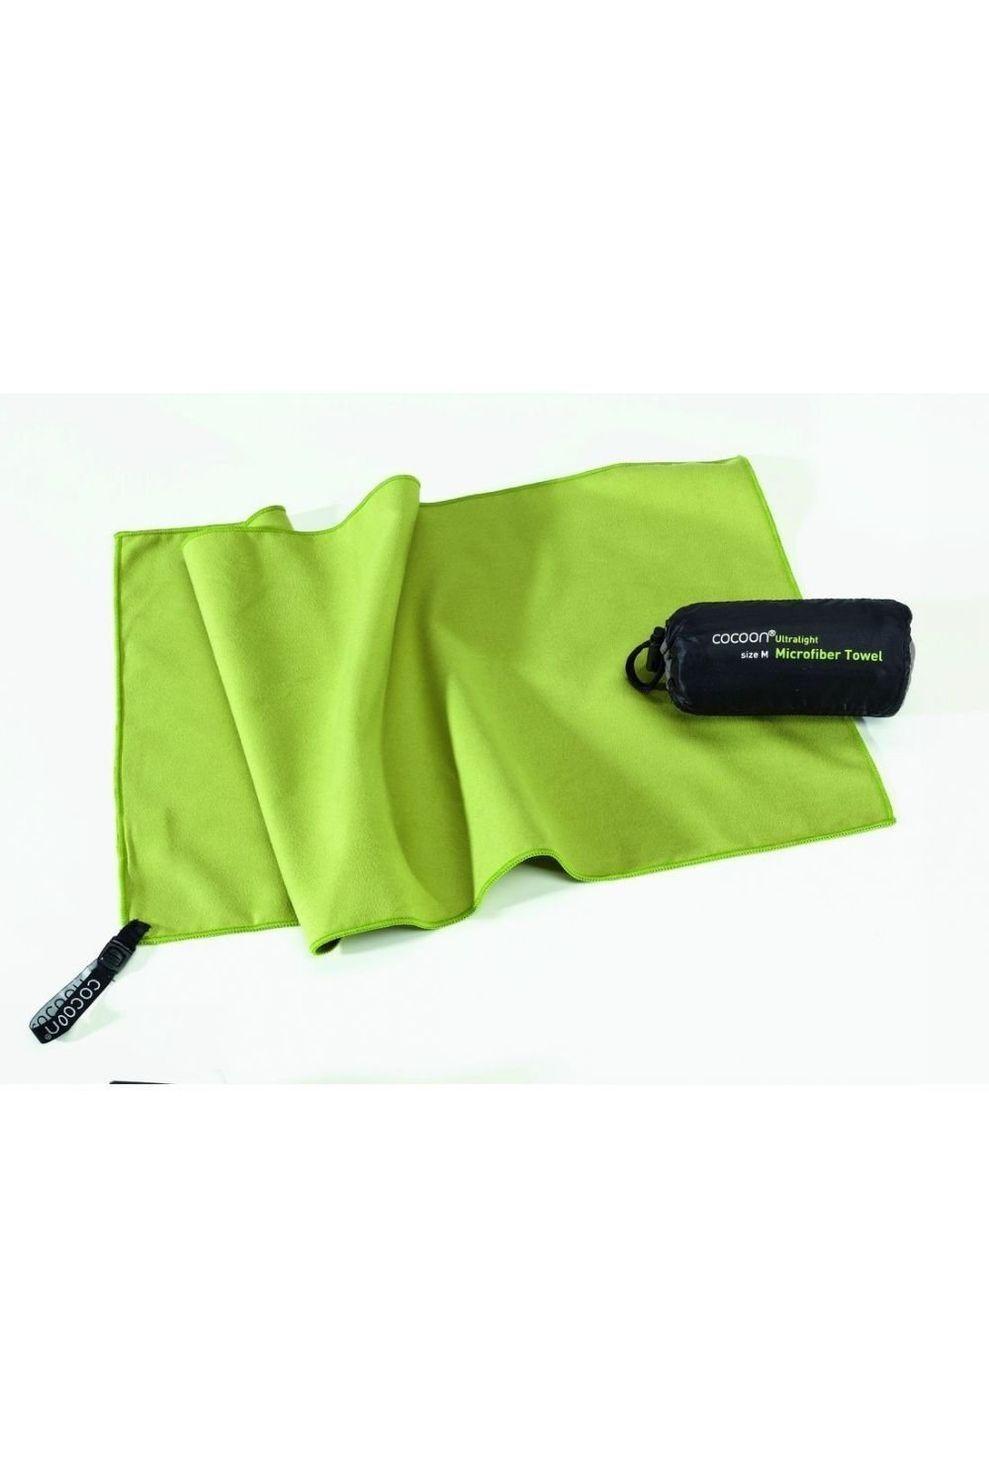 Cocoon Handdoek Towel Ultralight - Groen - Maten: S, M, L, XL